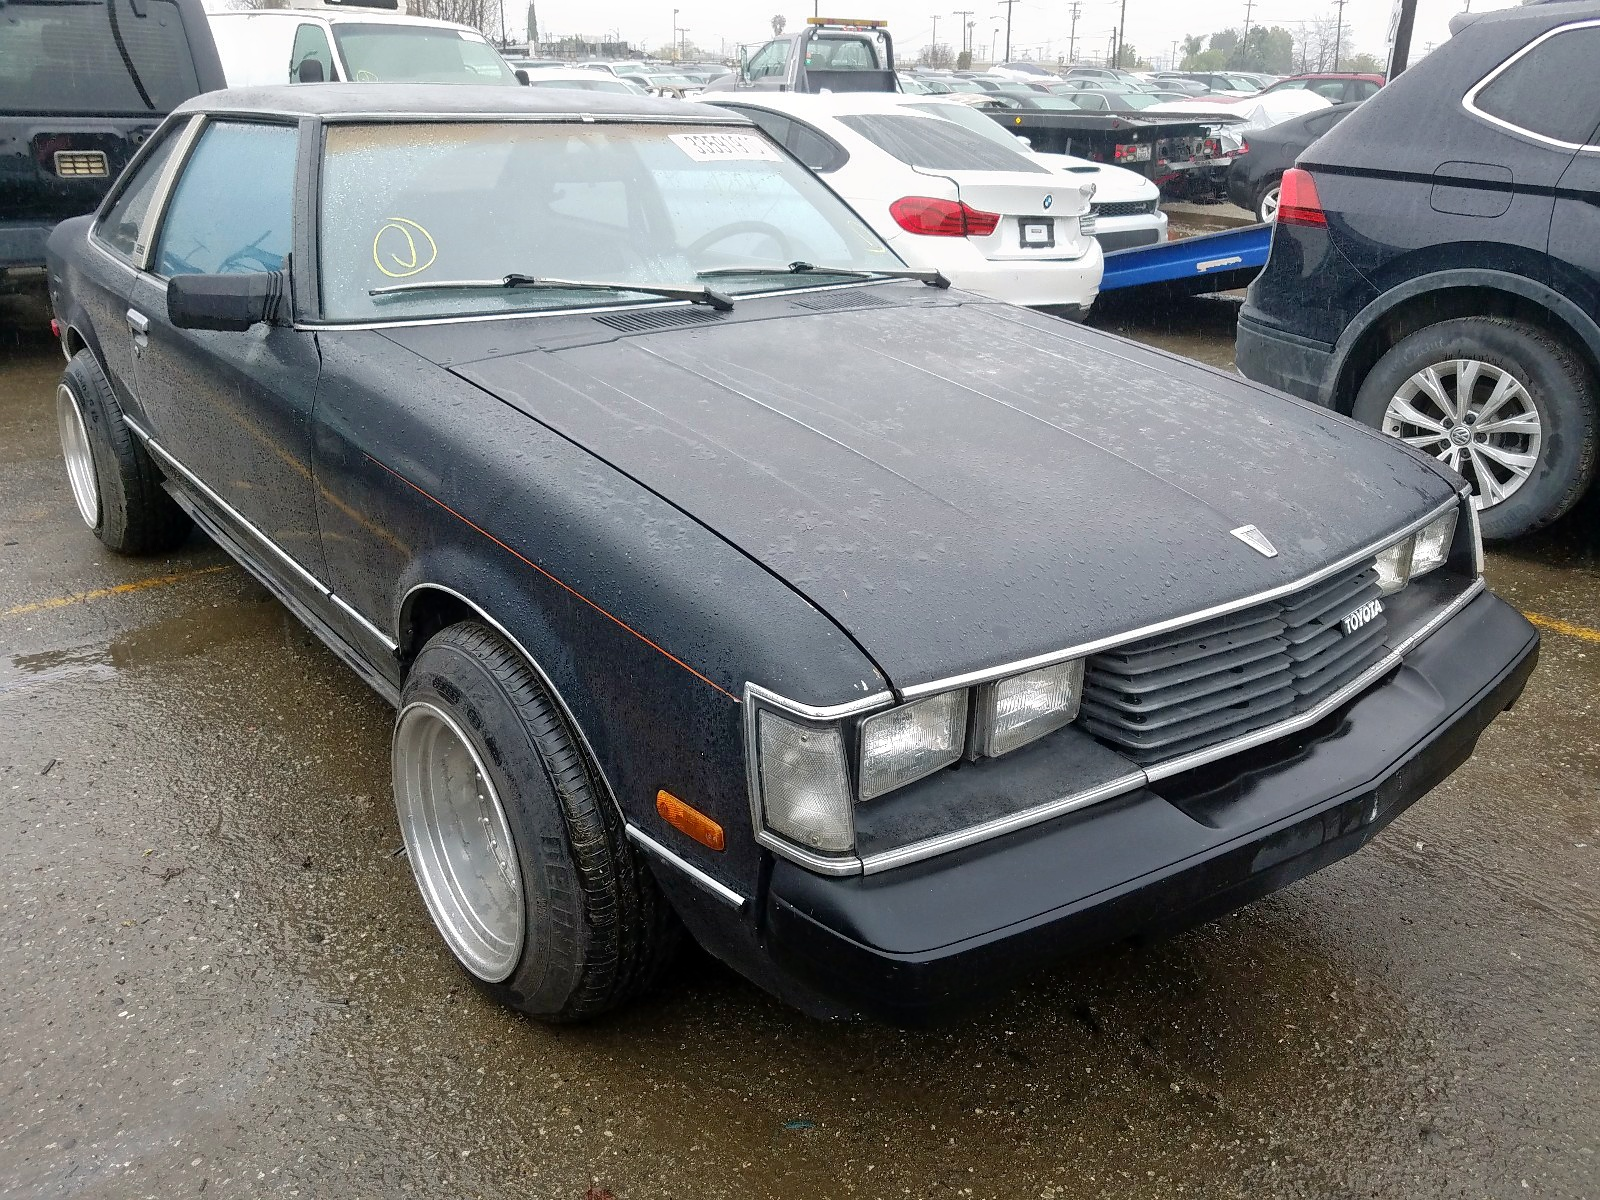 Kelebihan Kekurangan Toyota Celica 1980 Perbandingan Harga